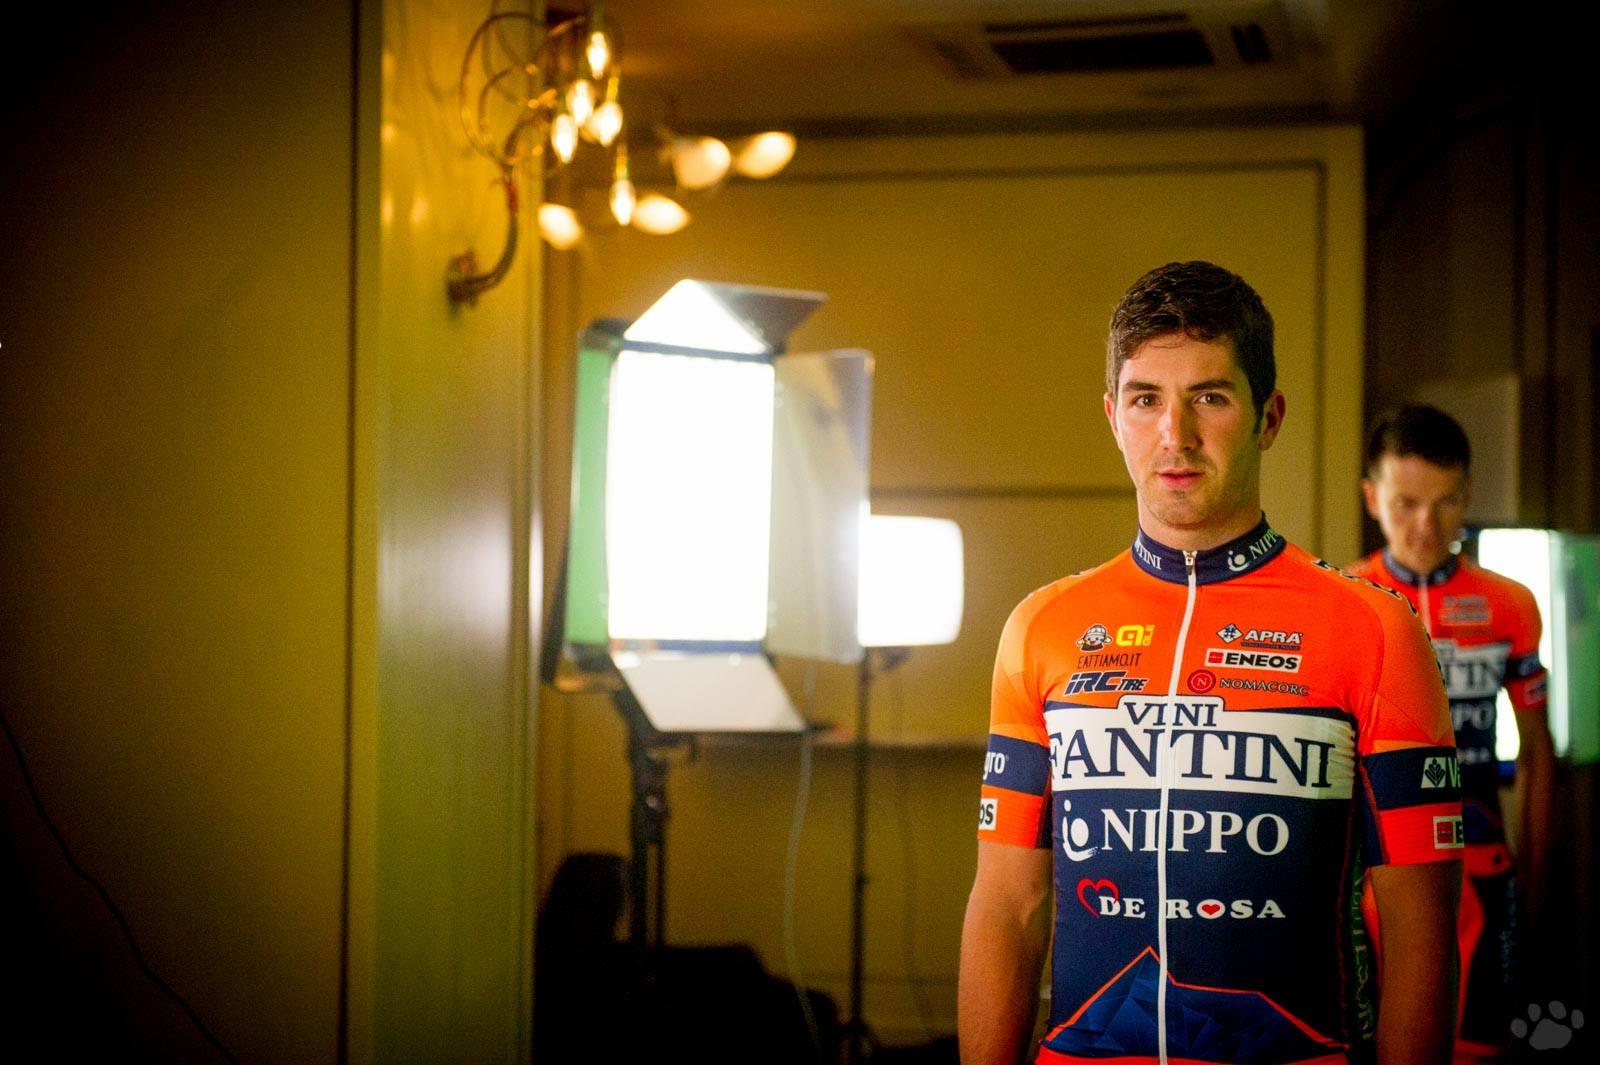 Eduard Grosu - sesiune foto Giro dItalia 2015